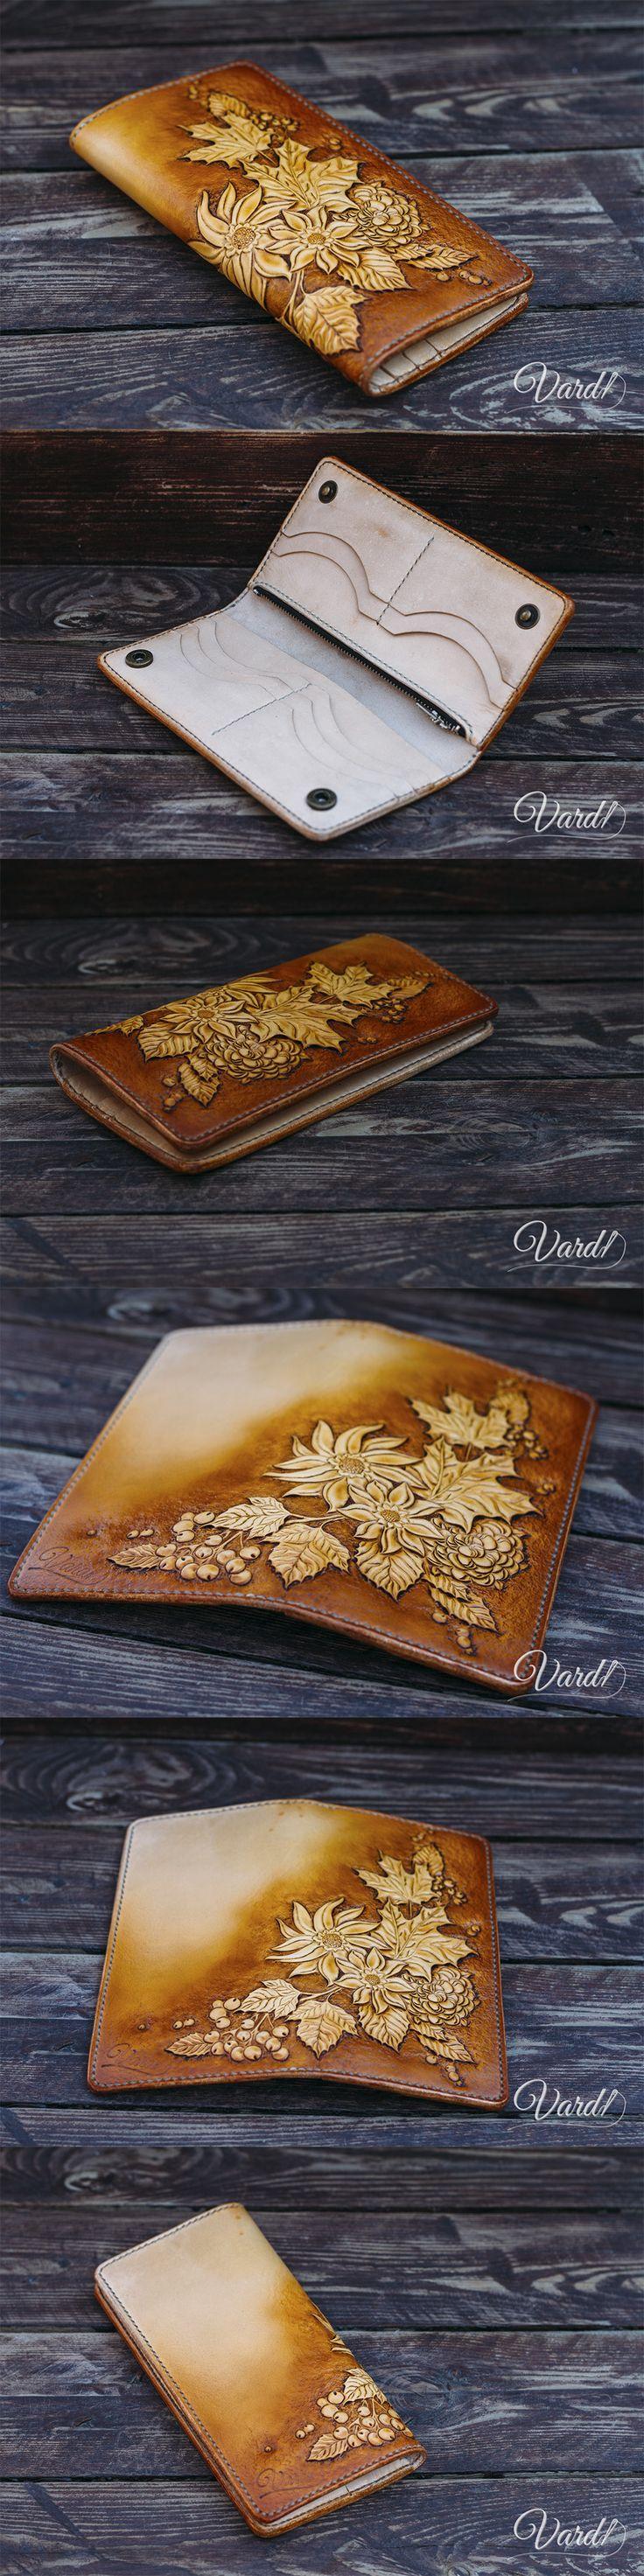 Handcrafted leather wallet, EMBOSS Vardi Craft Handmade long leather wallet man, girl vintage gray long wallet